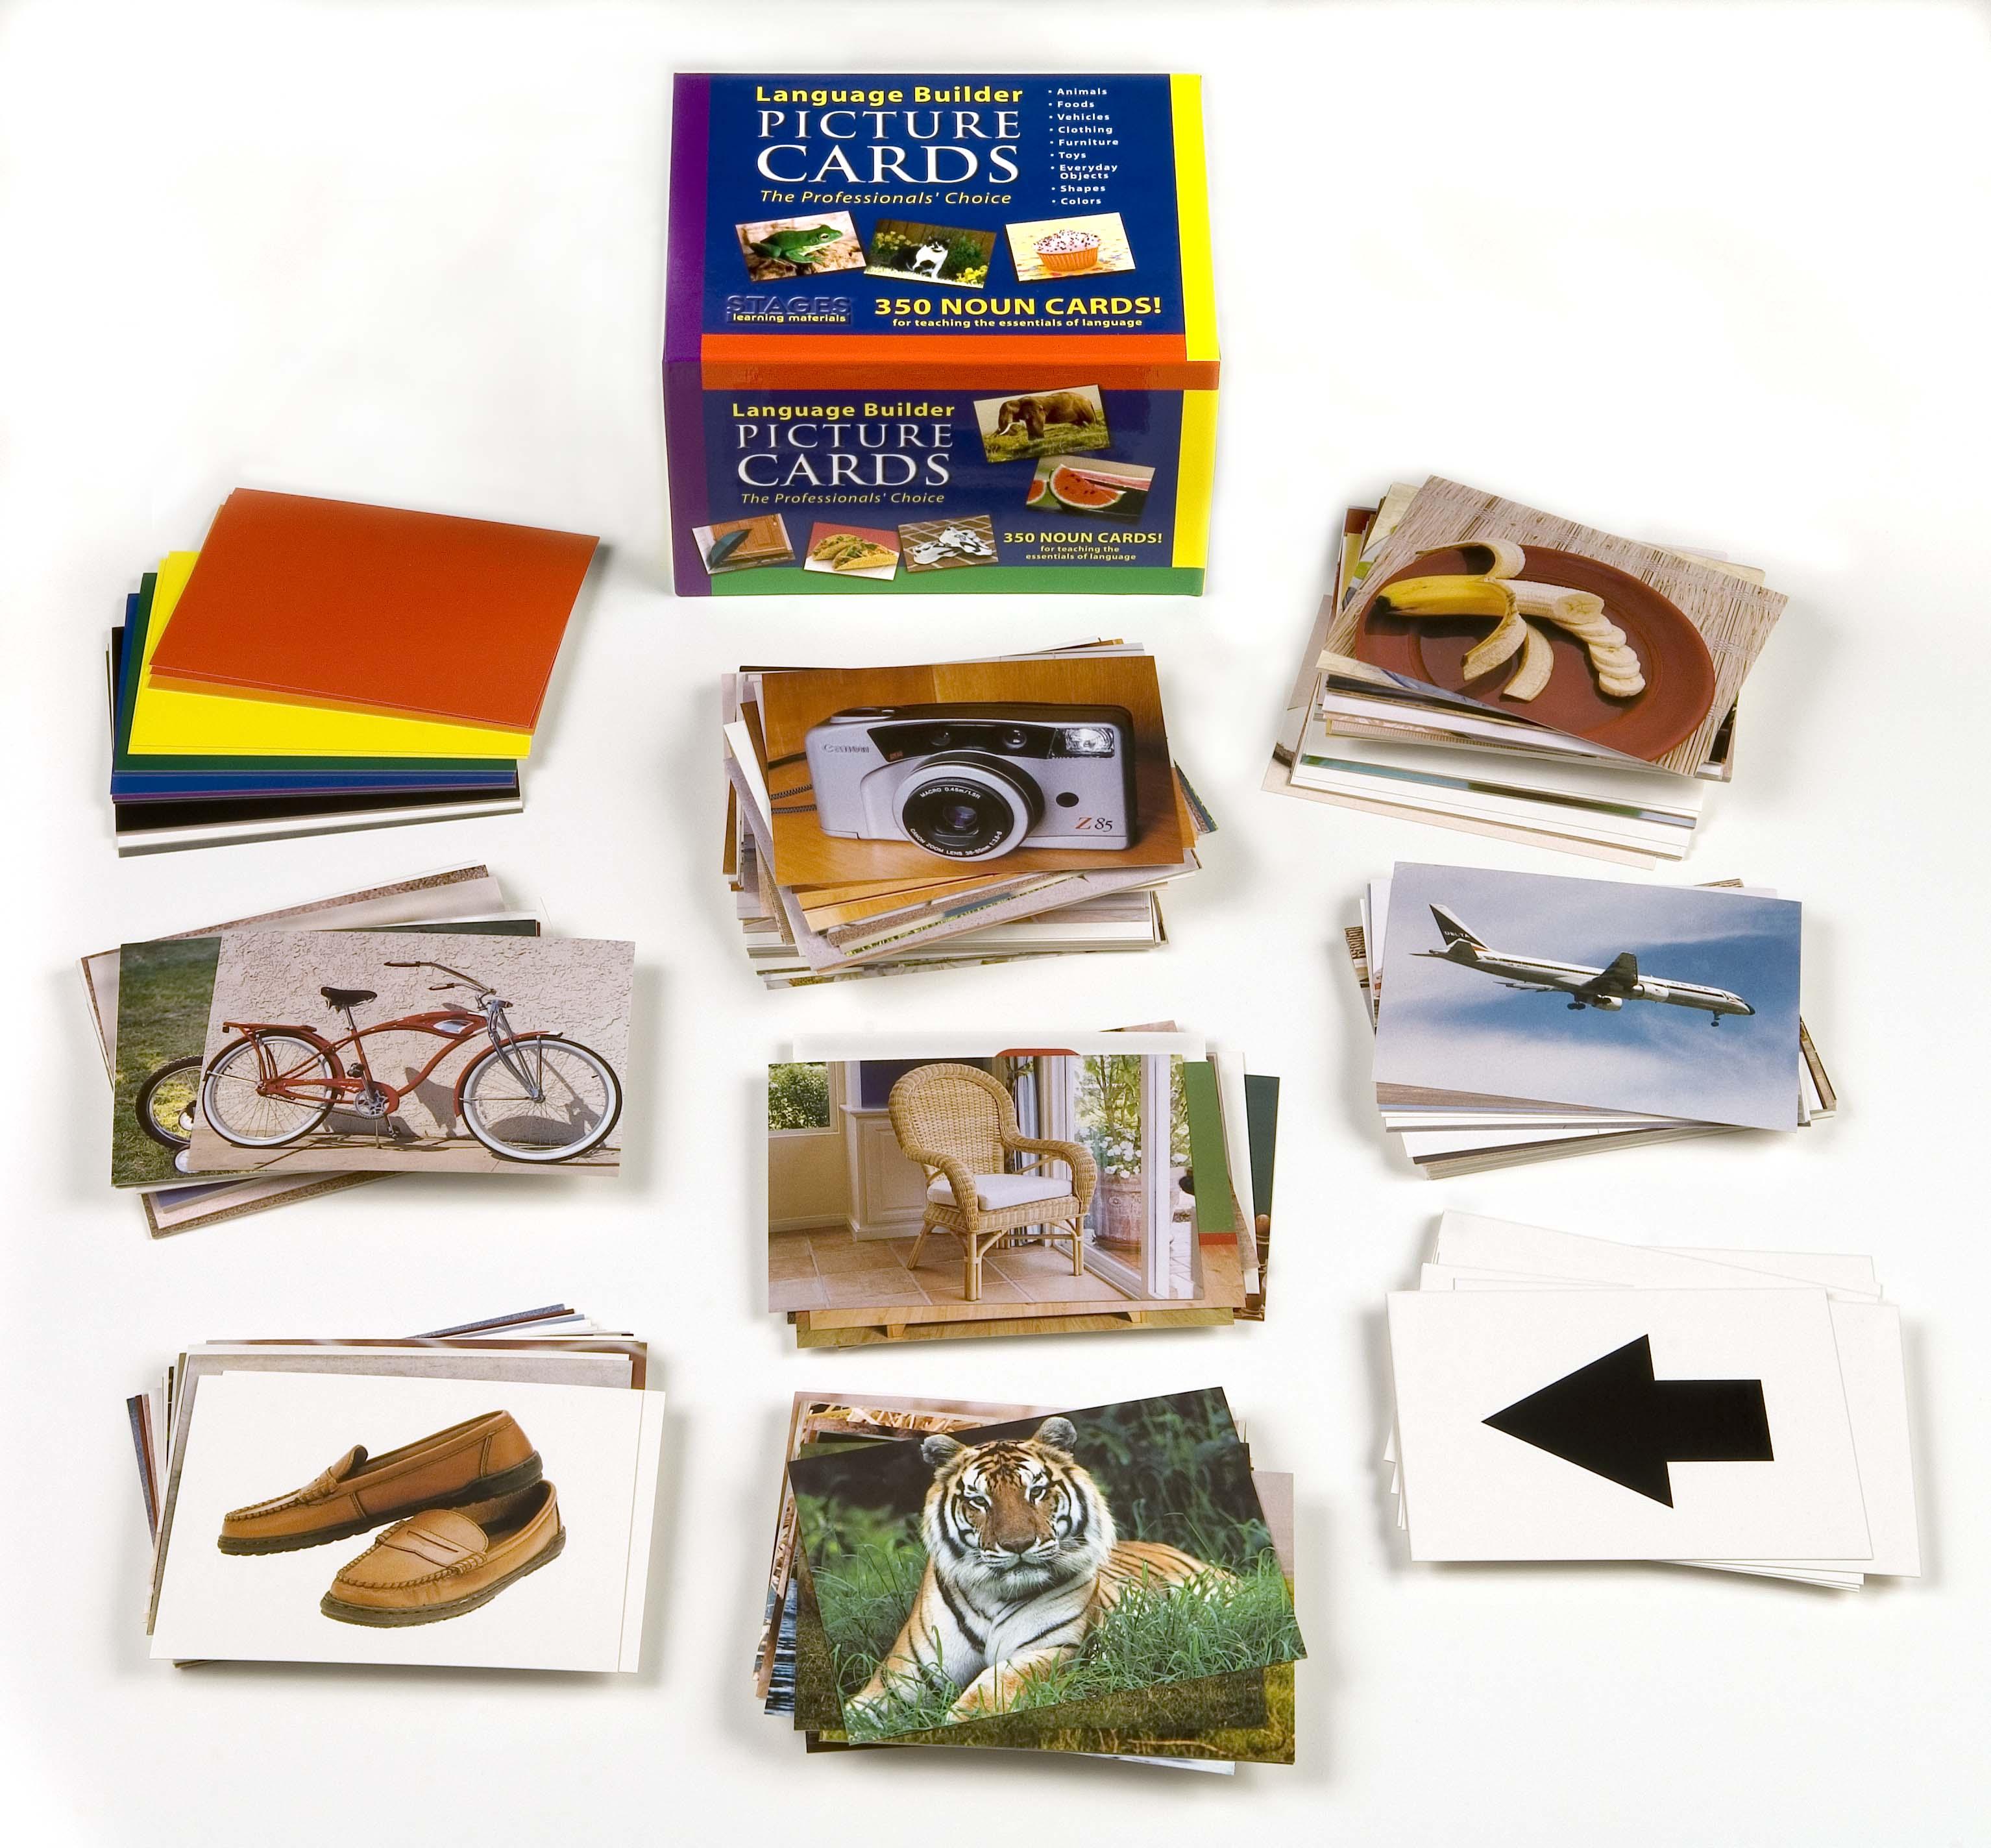 Language Builder Picture Cards for Autism Education